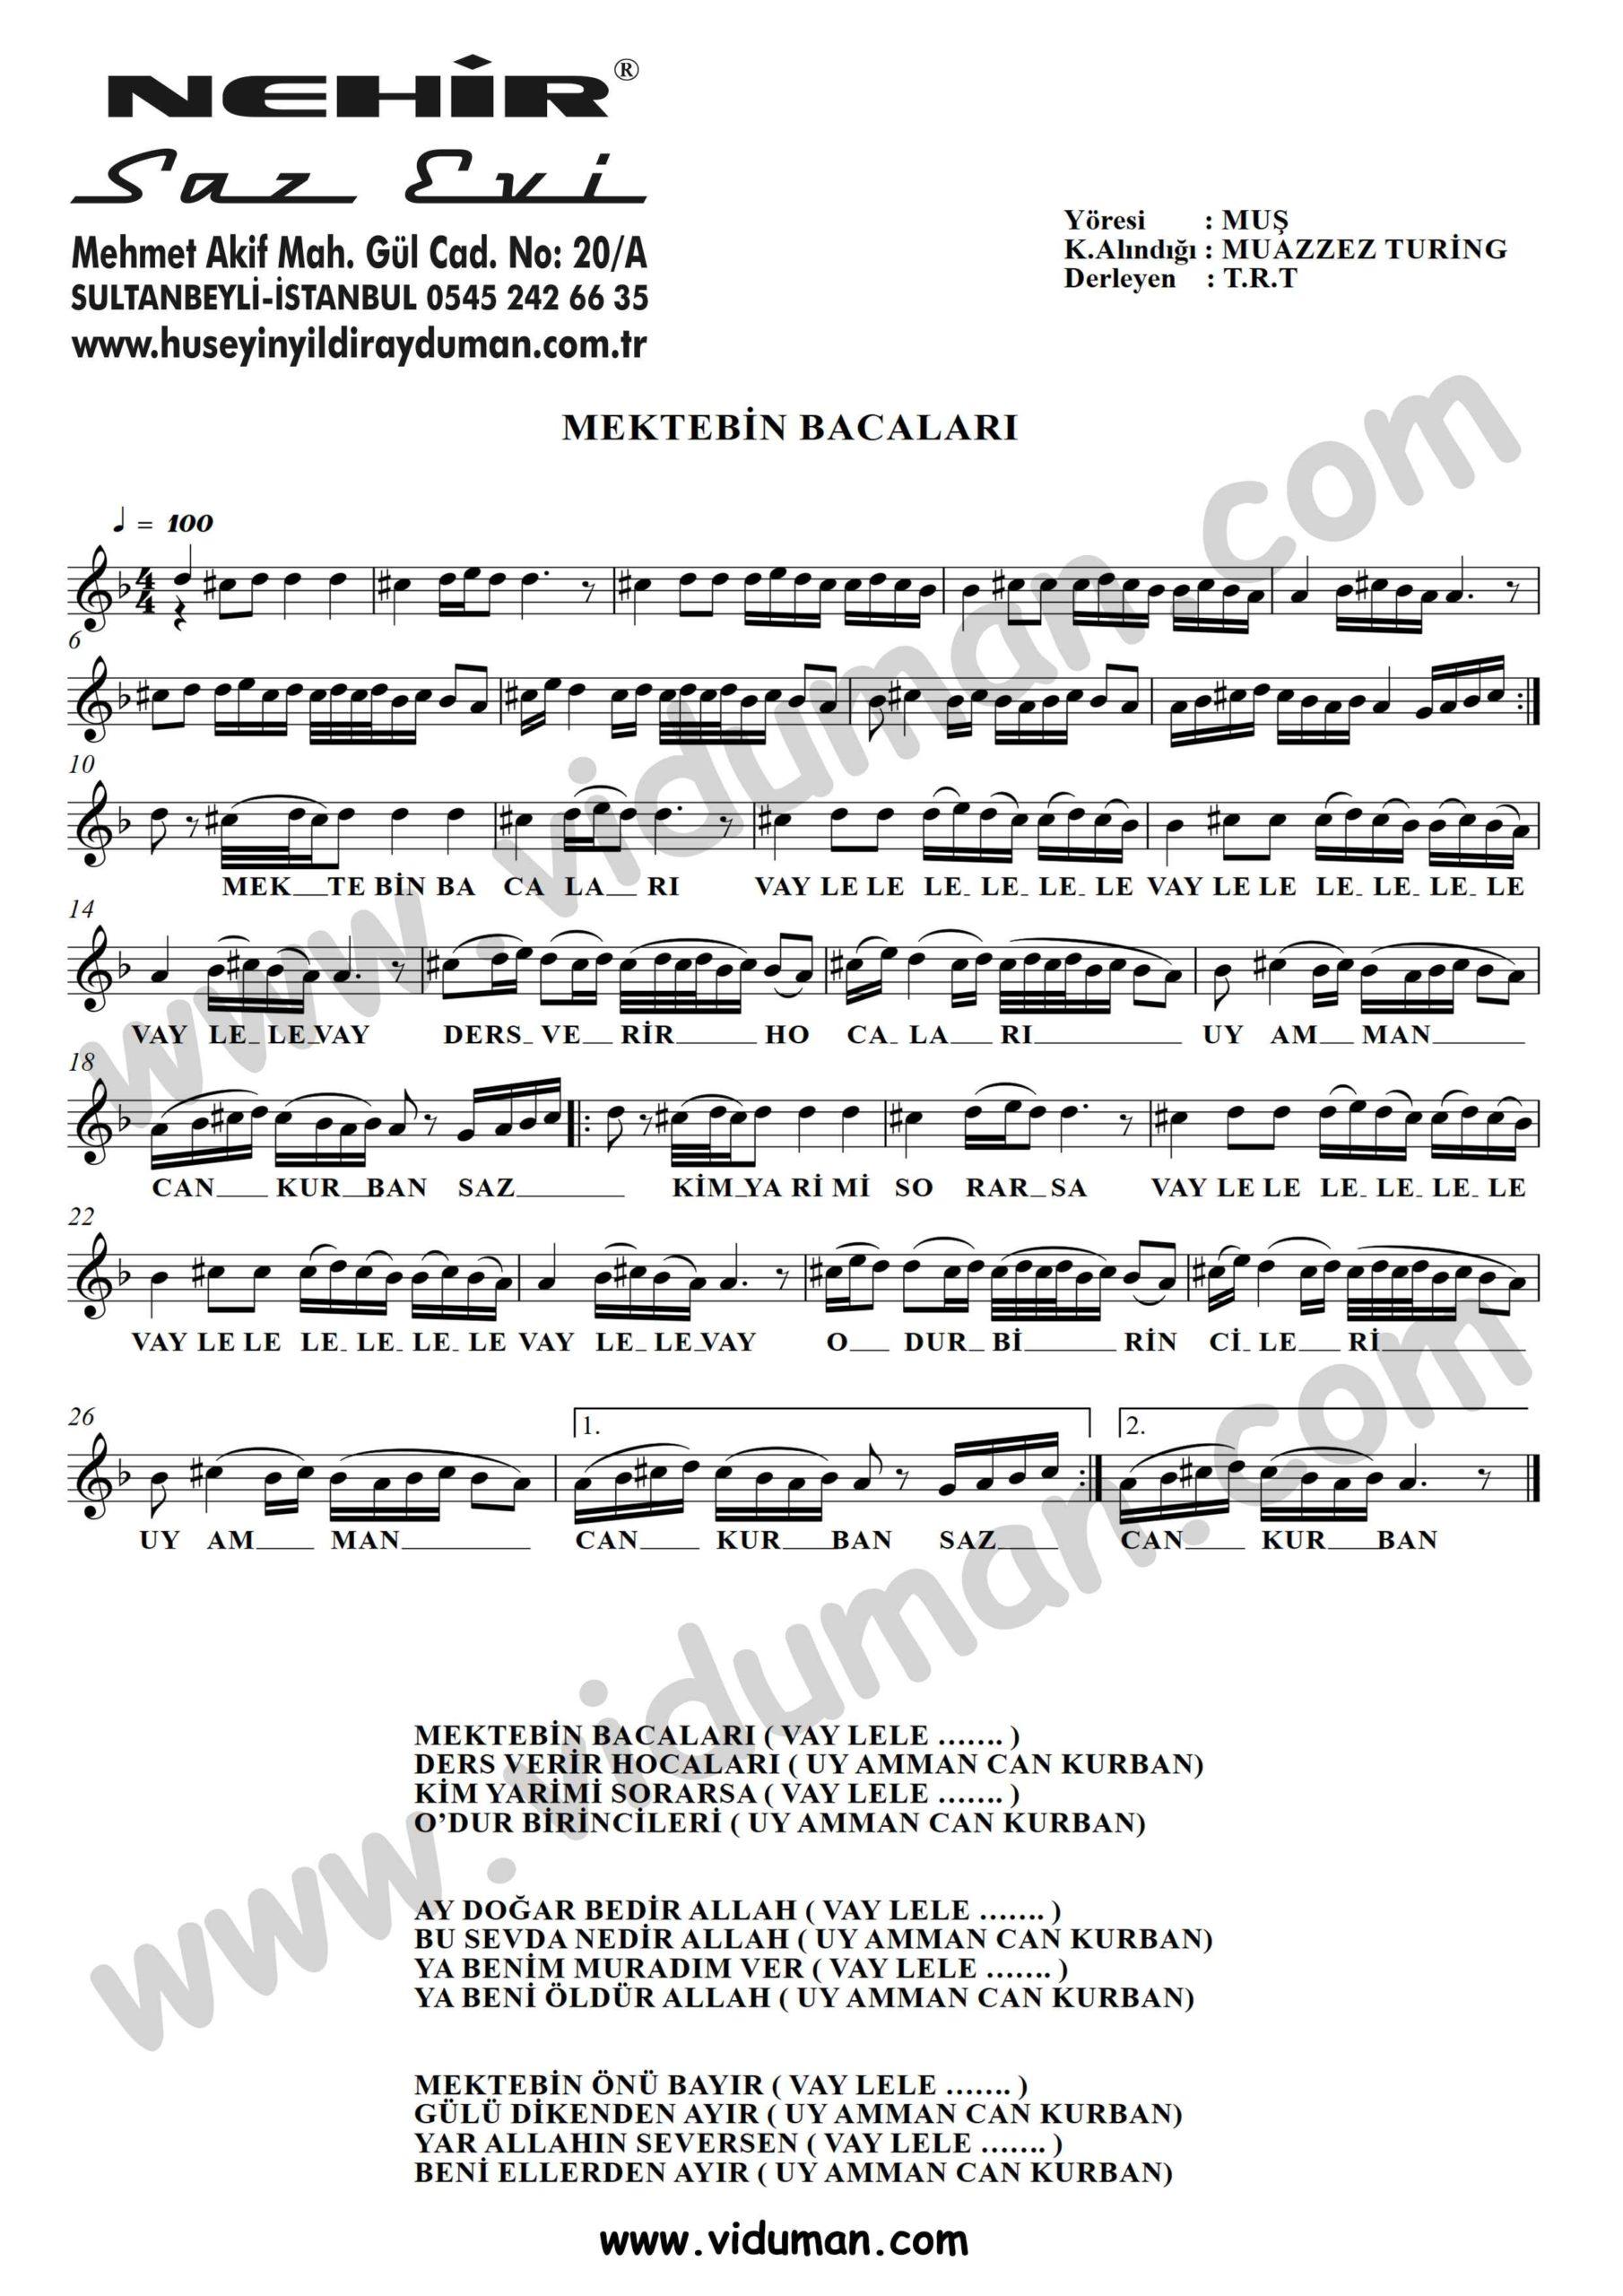 Mektebin Bacalari-Baglama-Saz-Turku Notalari